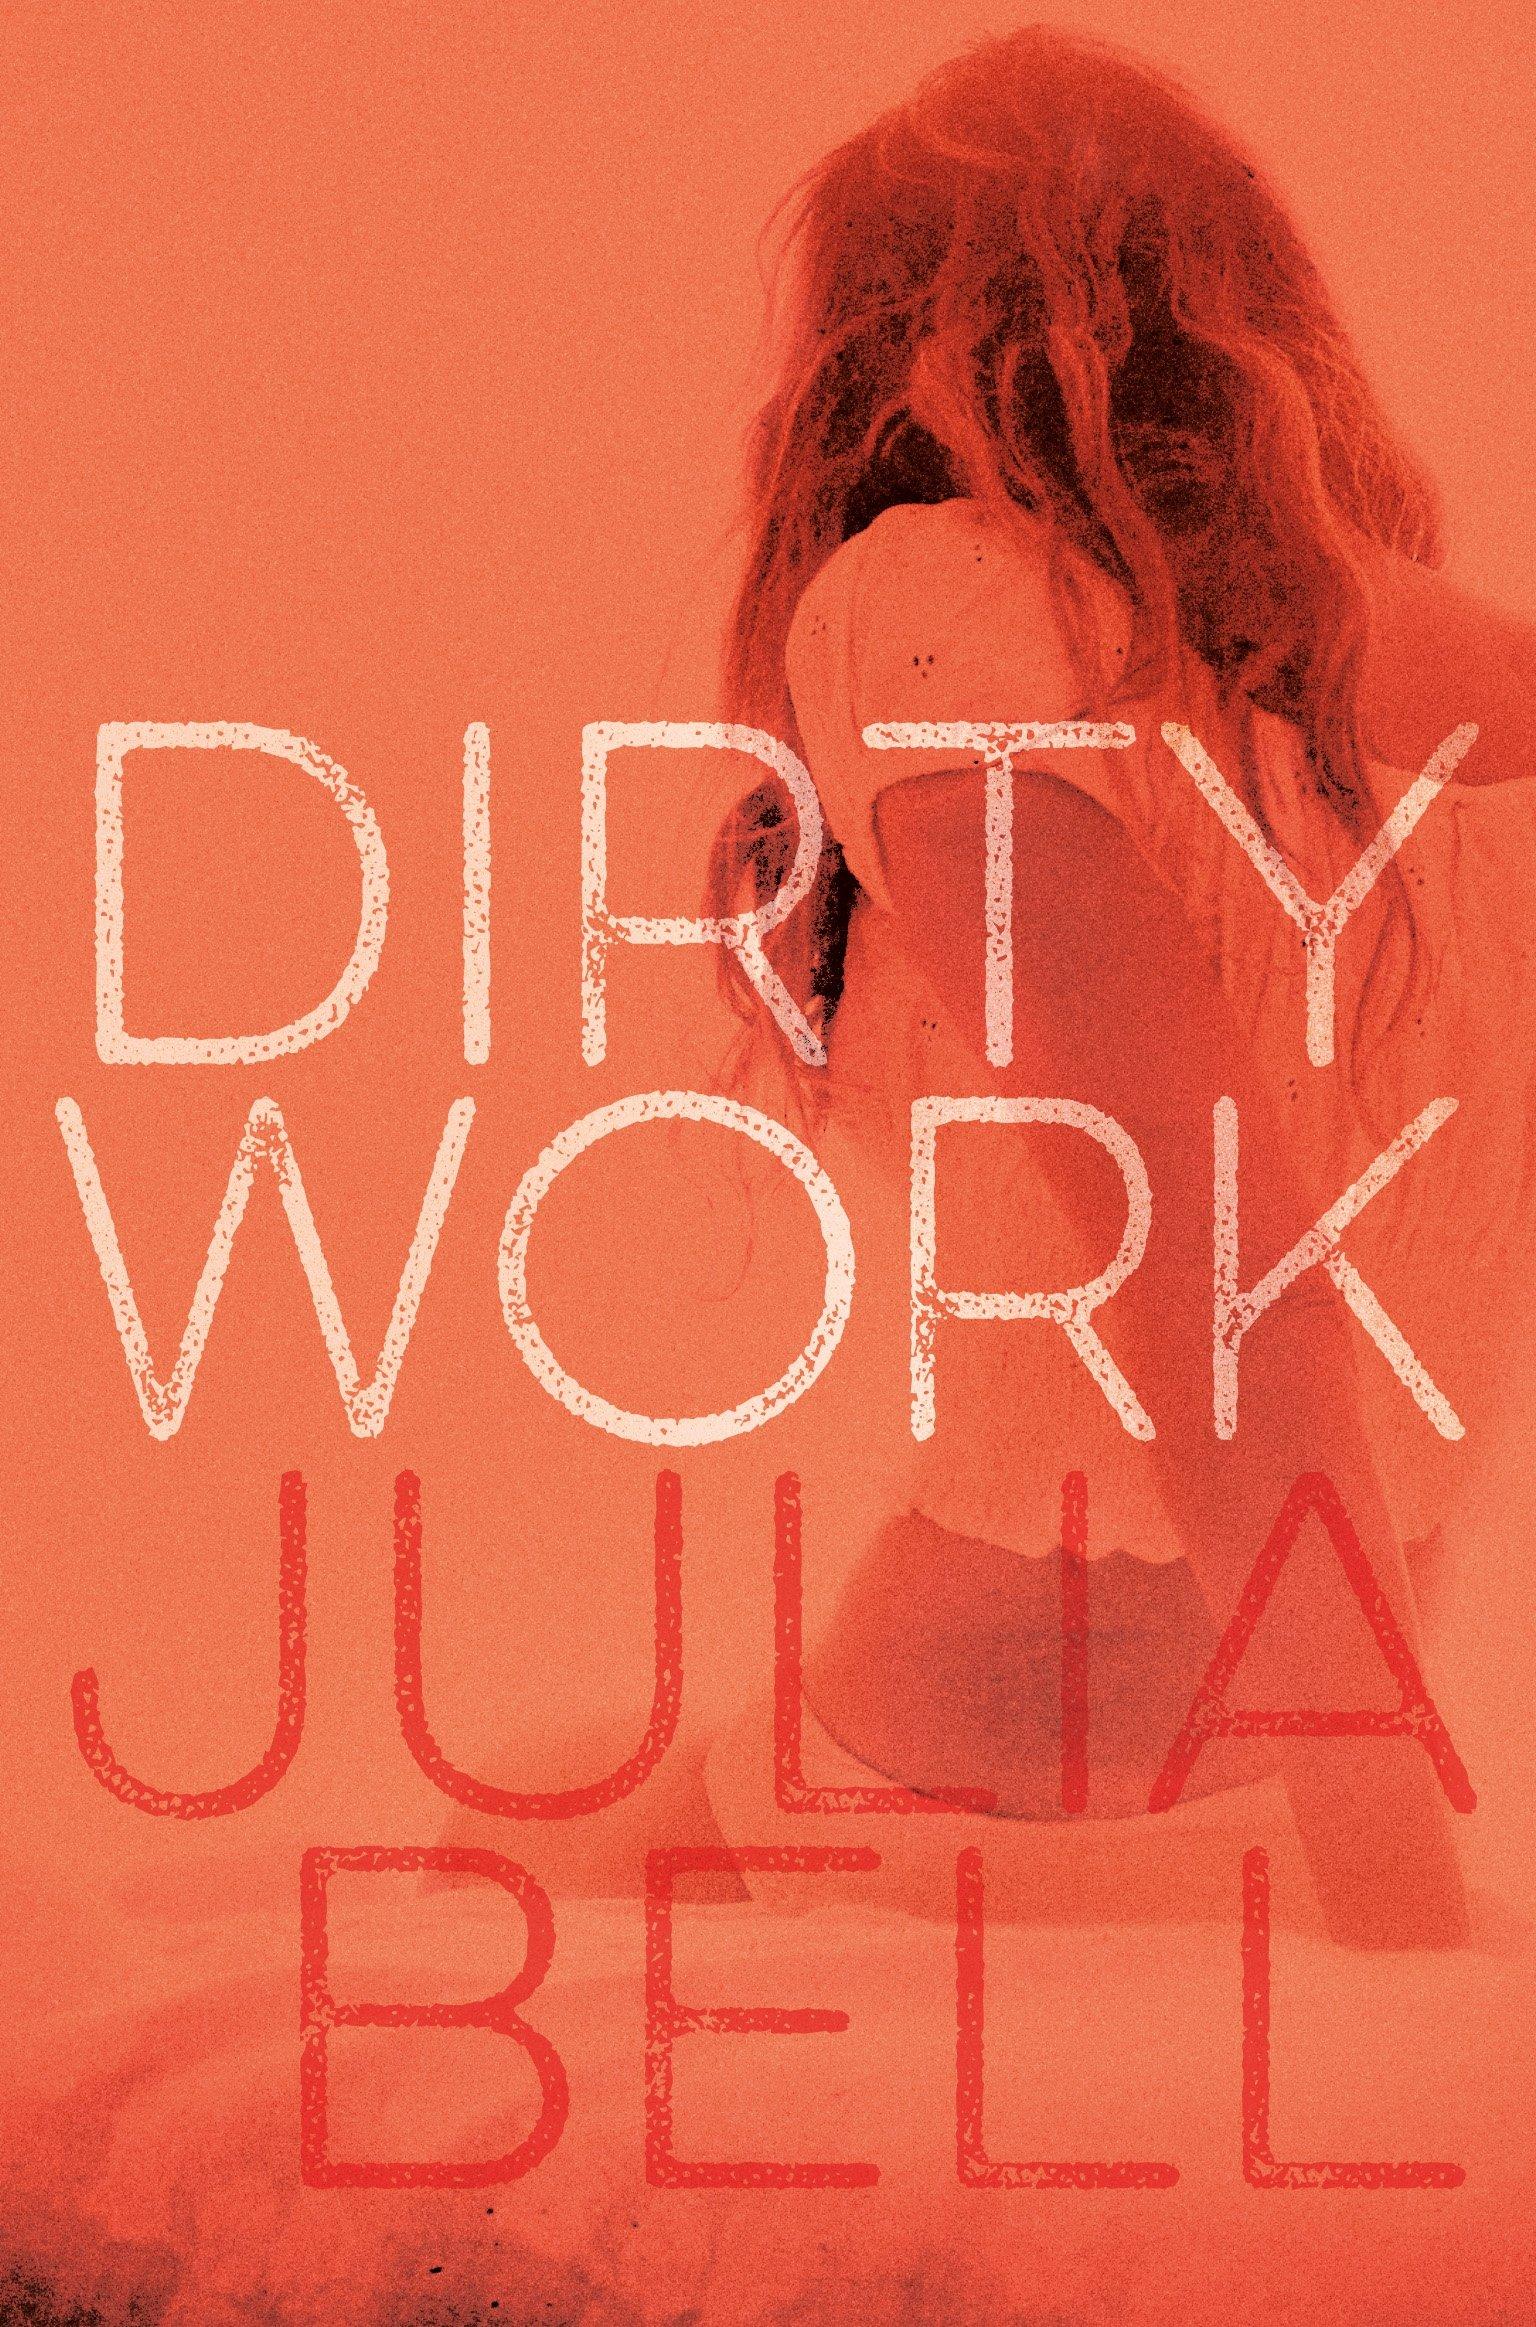 Dirty Work dirty work